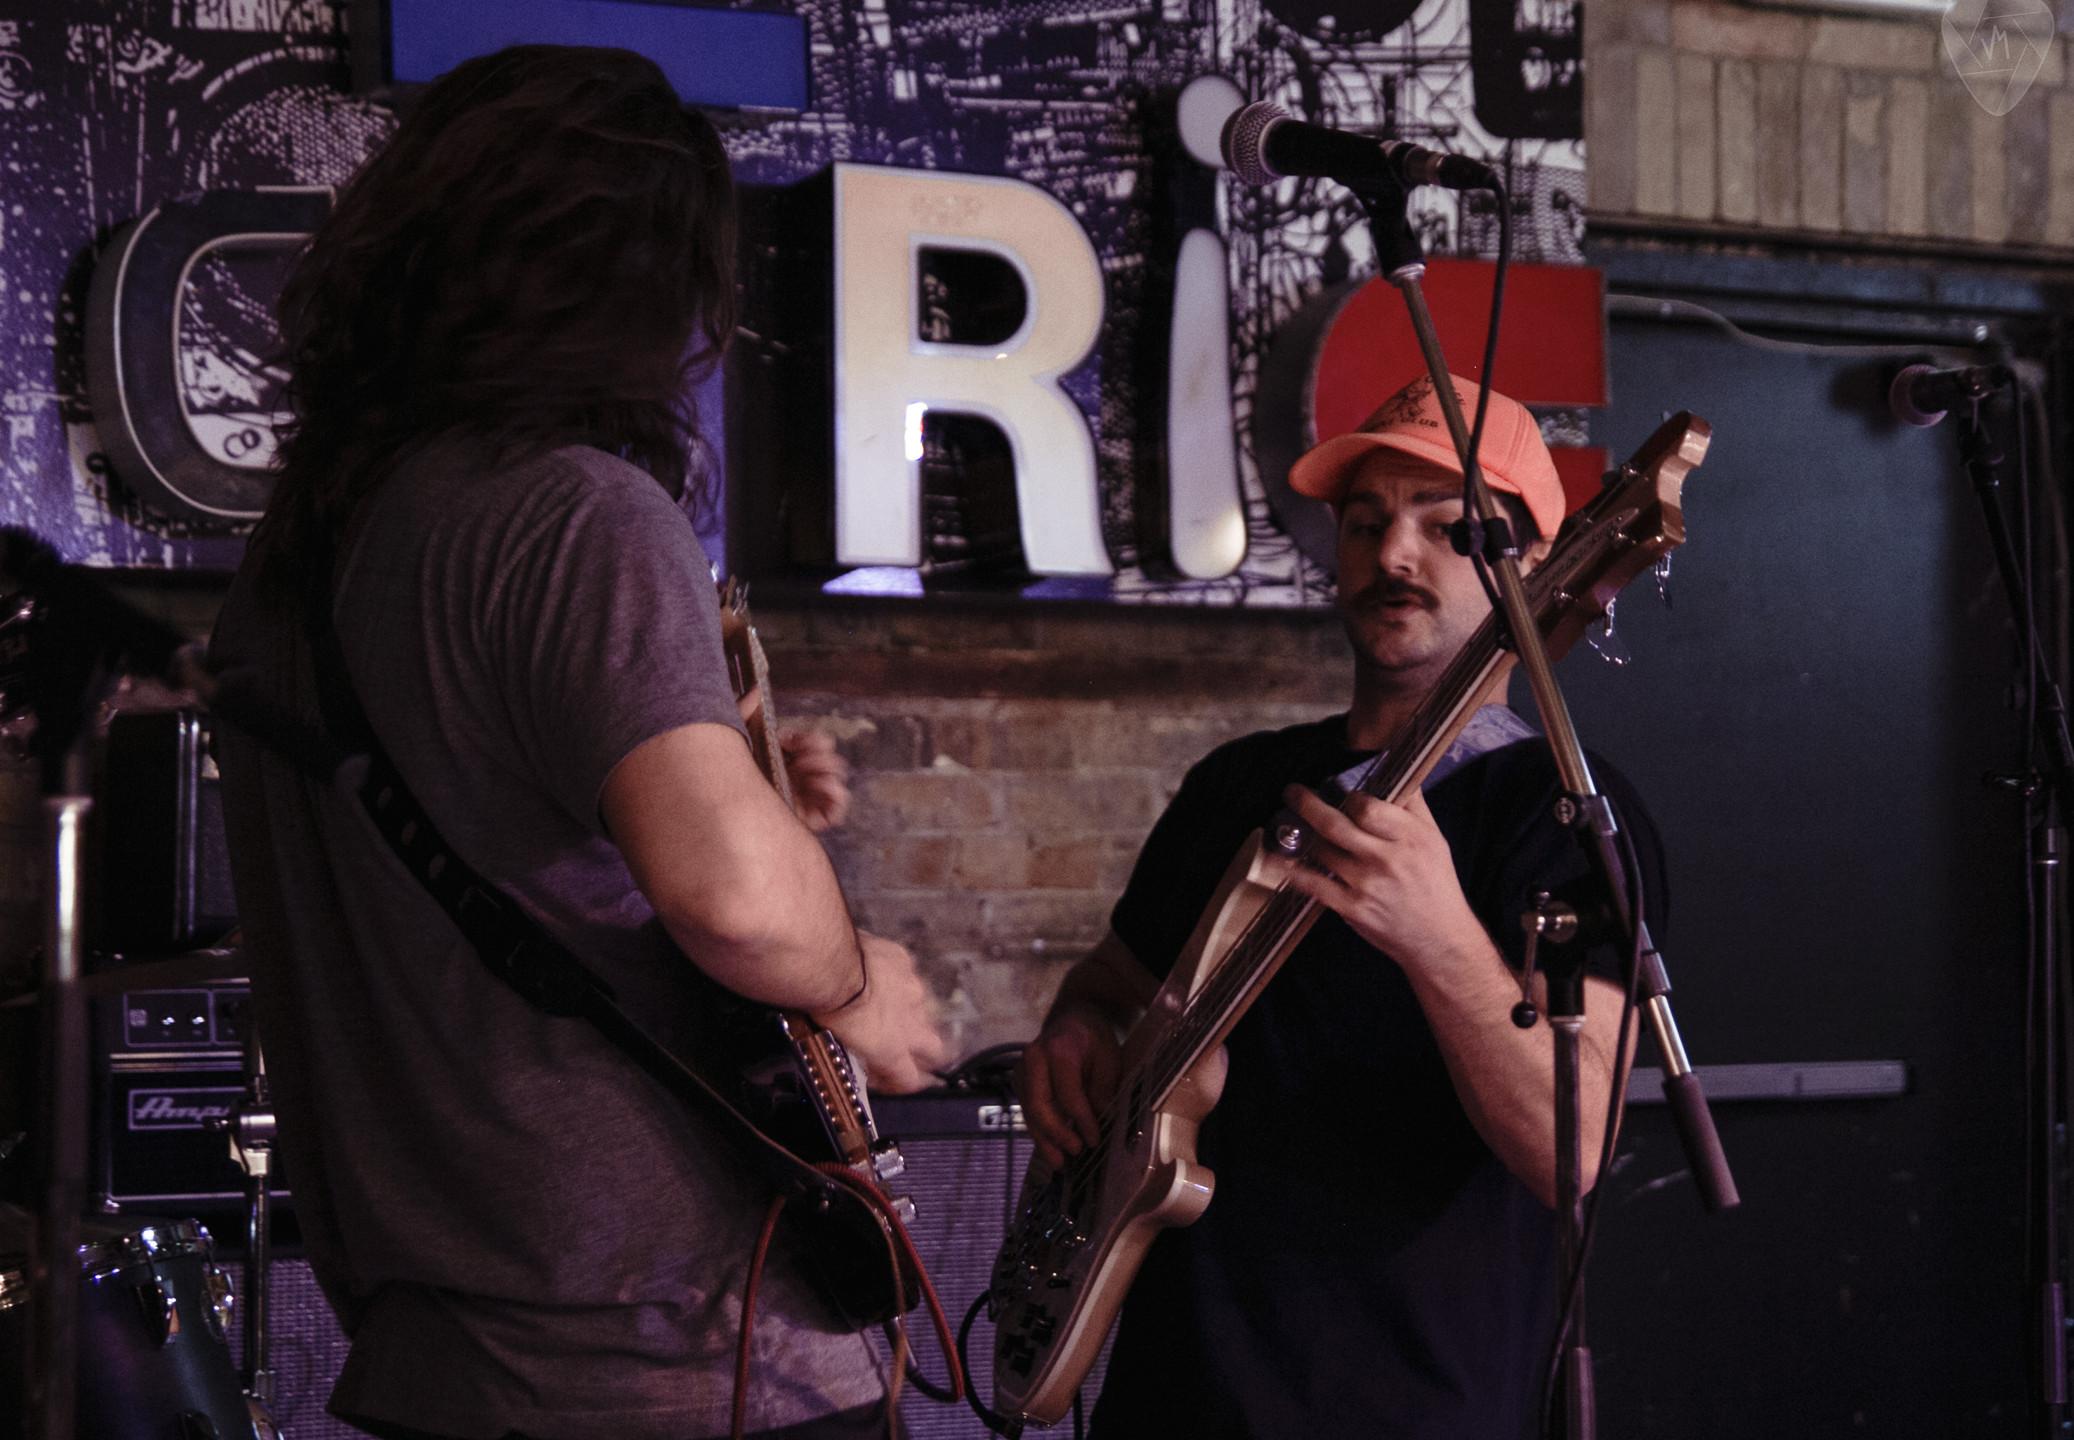 saturday: Band of Rascals